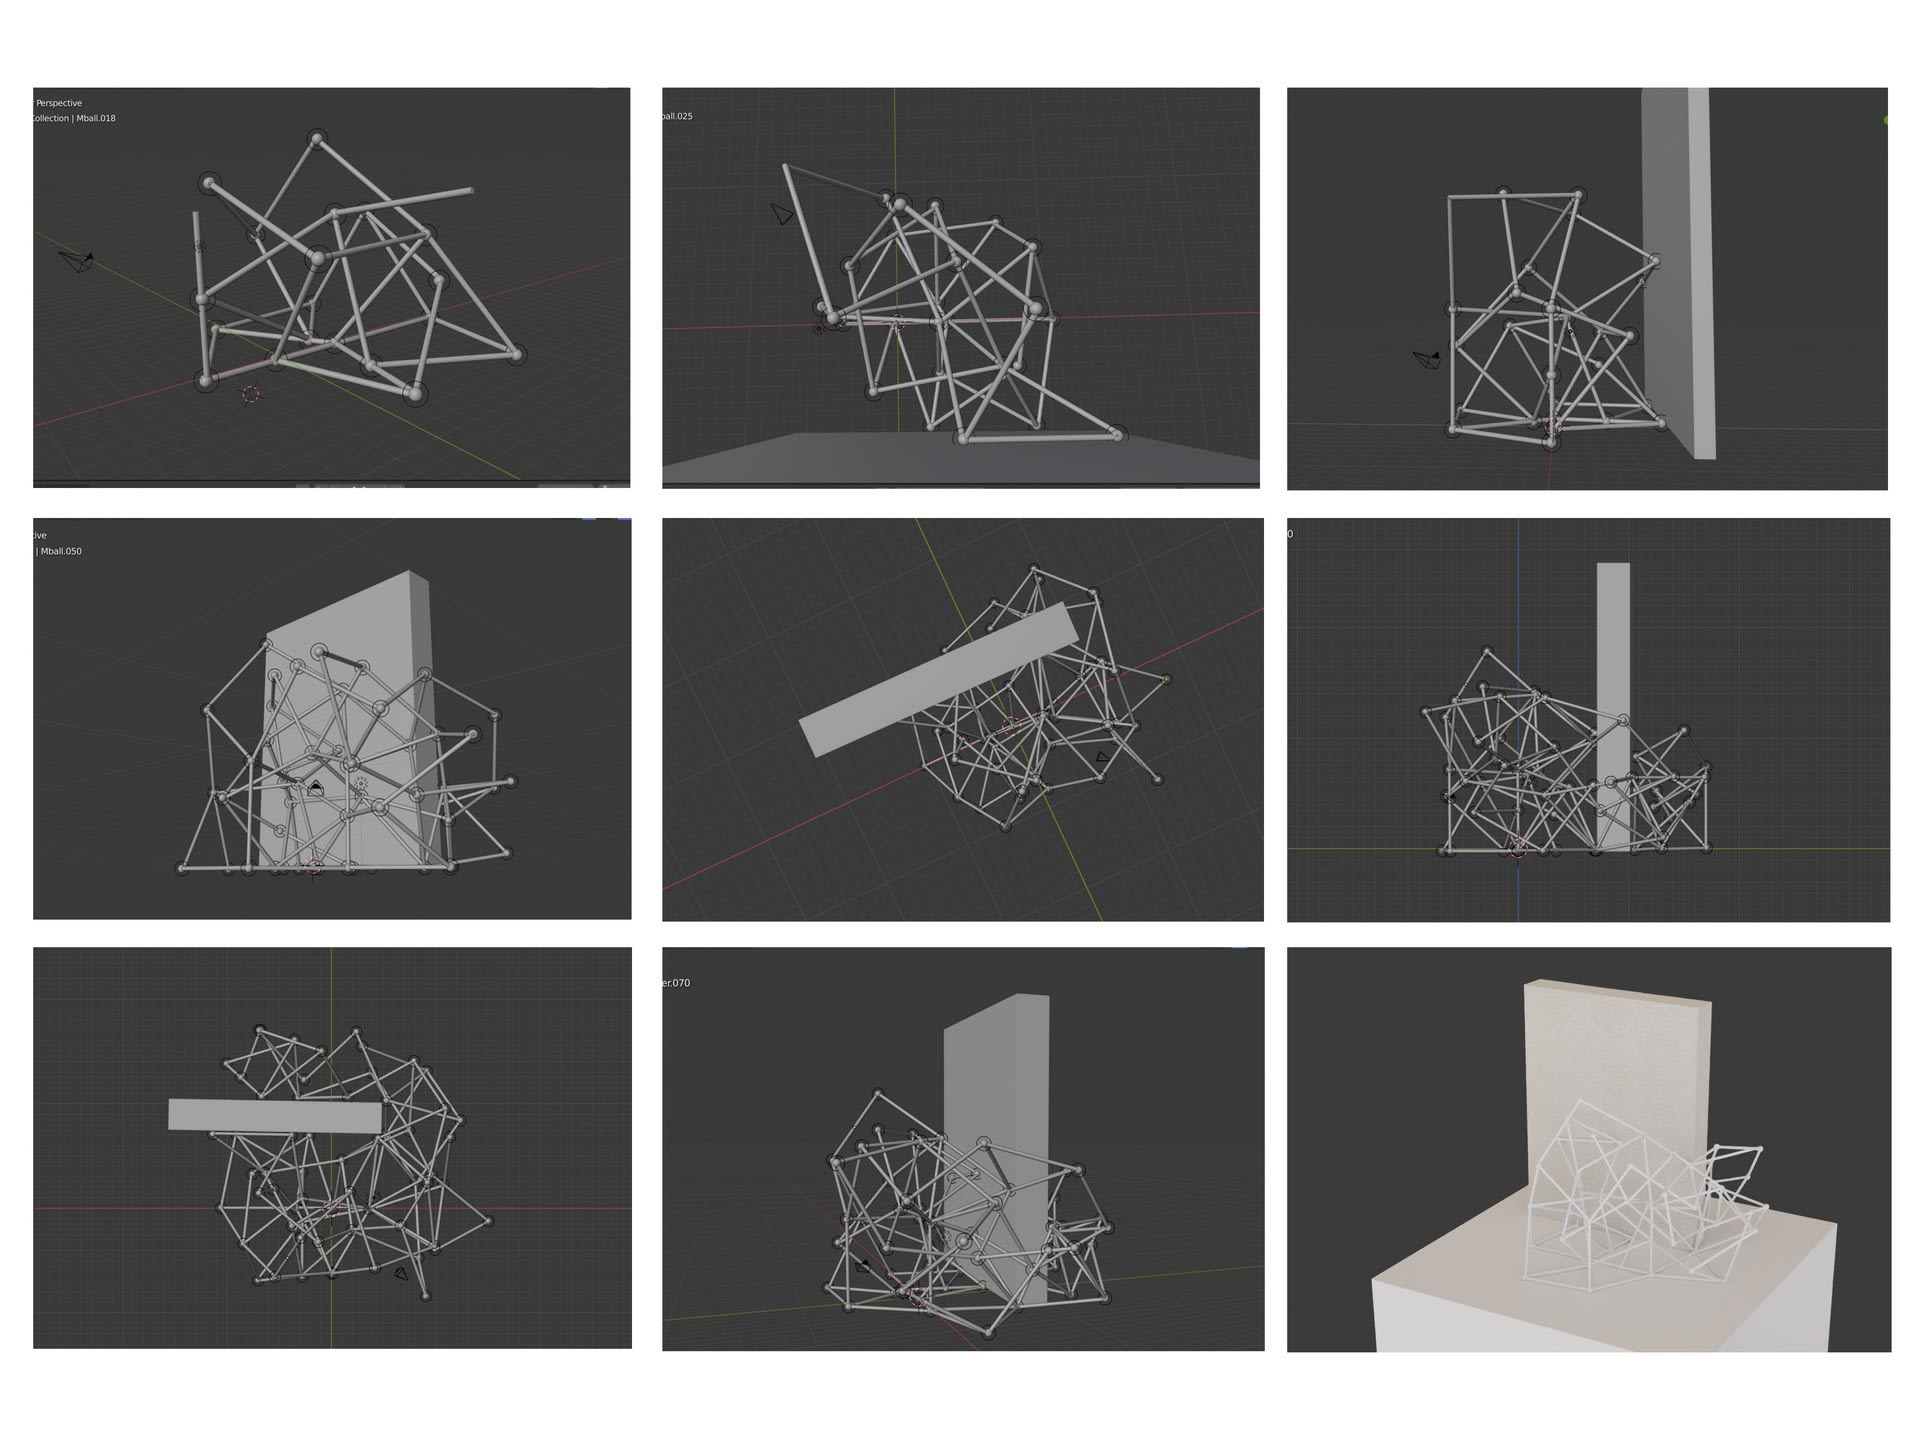 Structural Embrace (building process)